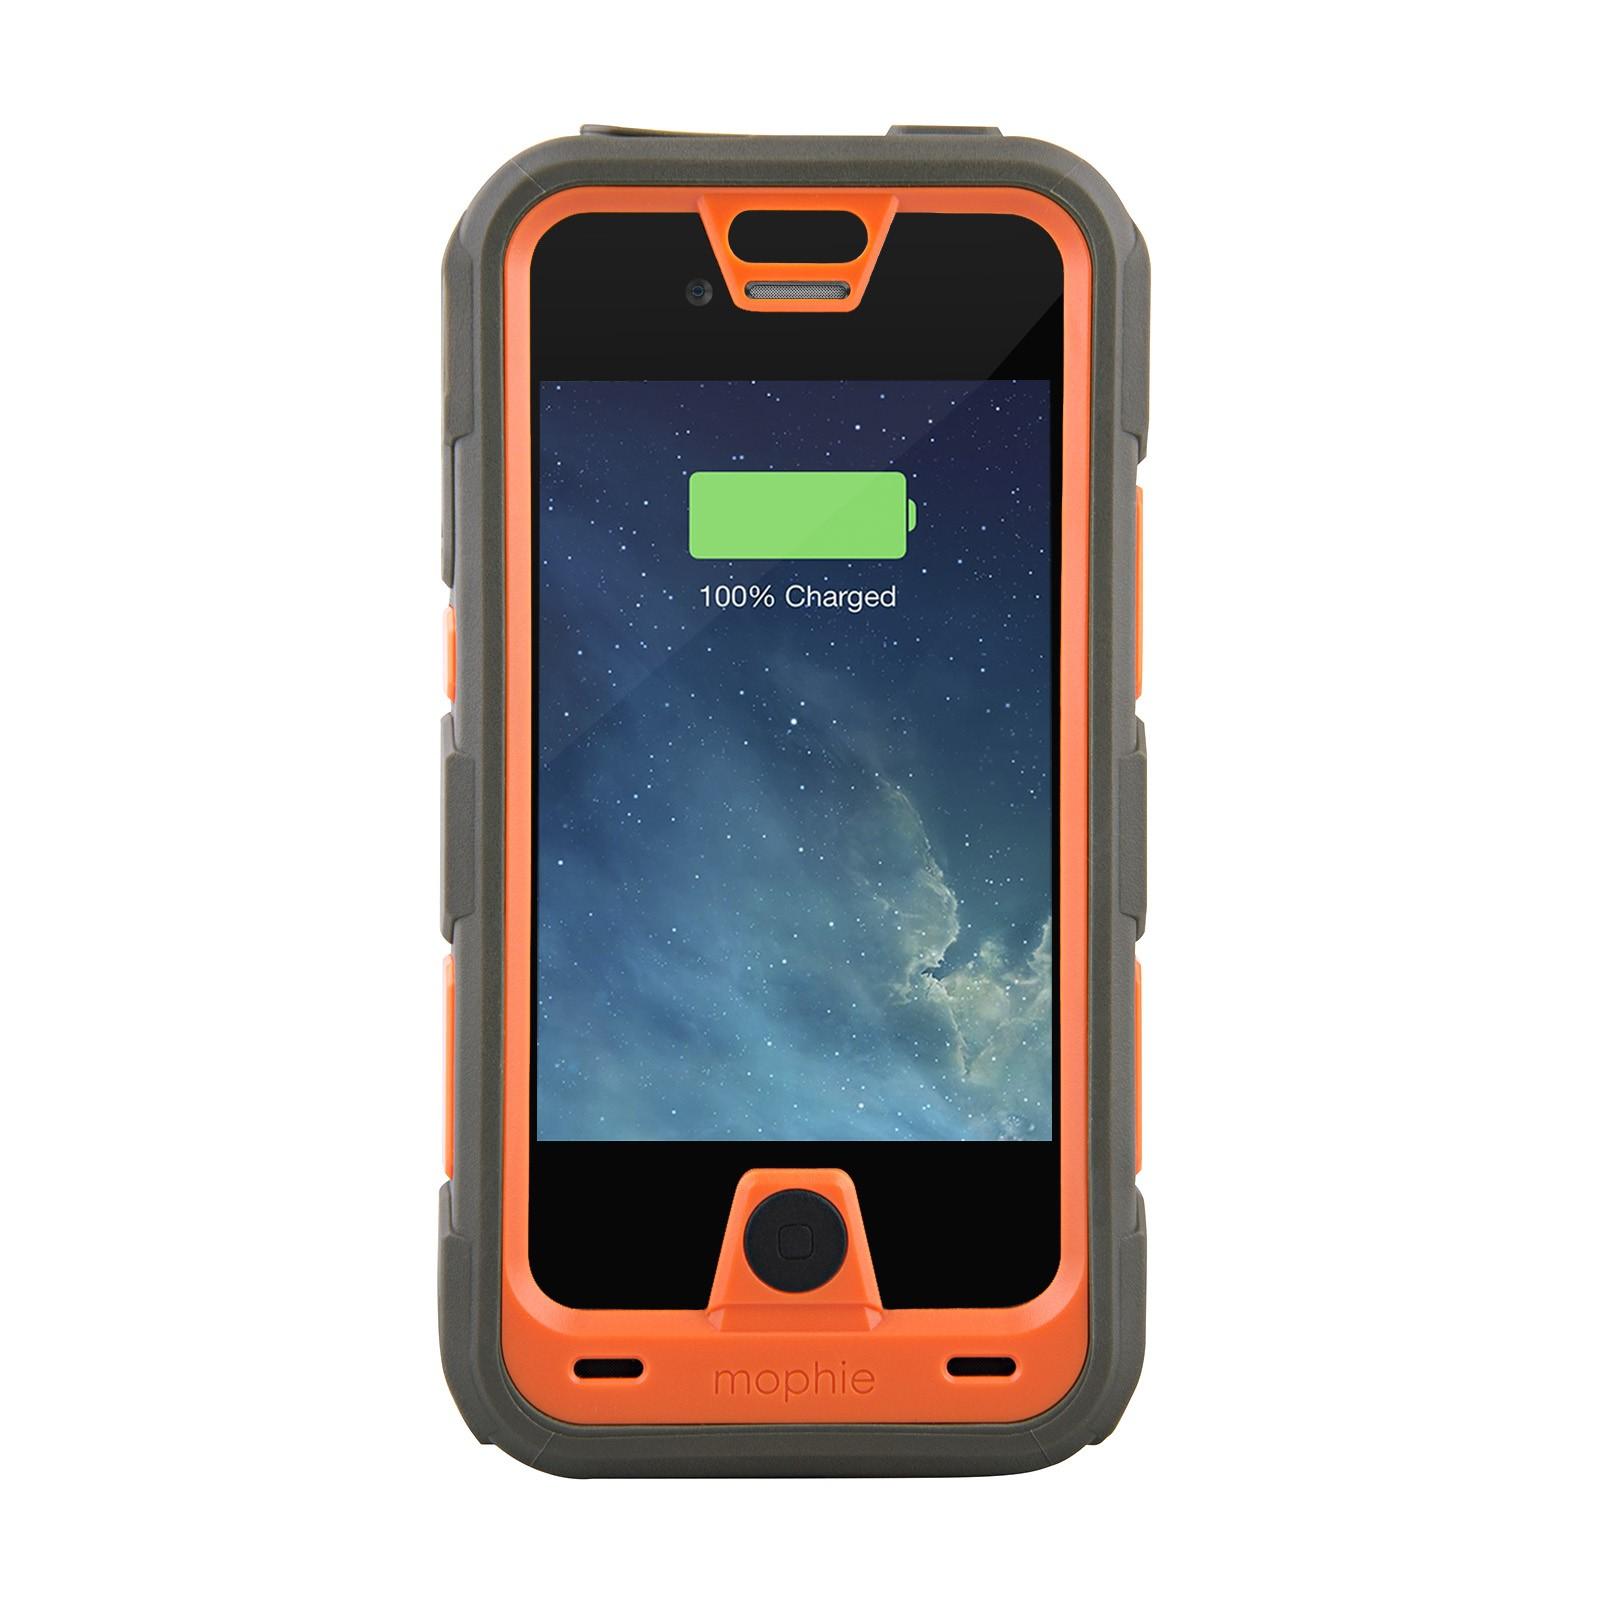 mophie juice pack pro rugged water resistant battery case for apple iphone 4s 4 ebay. Black Bedroom Furniture Sets. Home Design Ideas